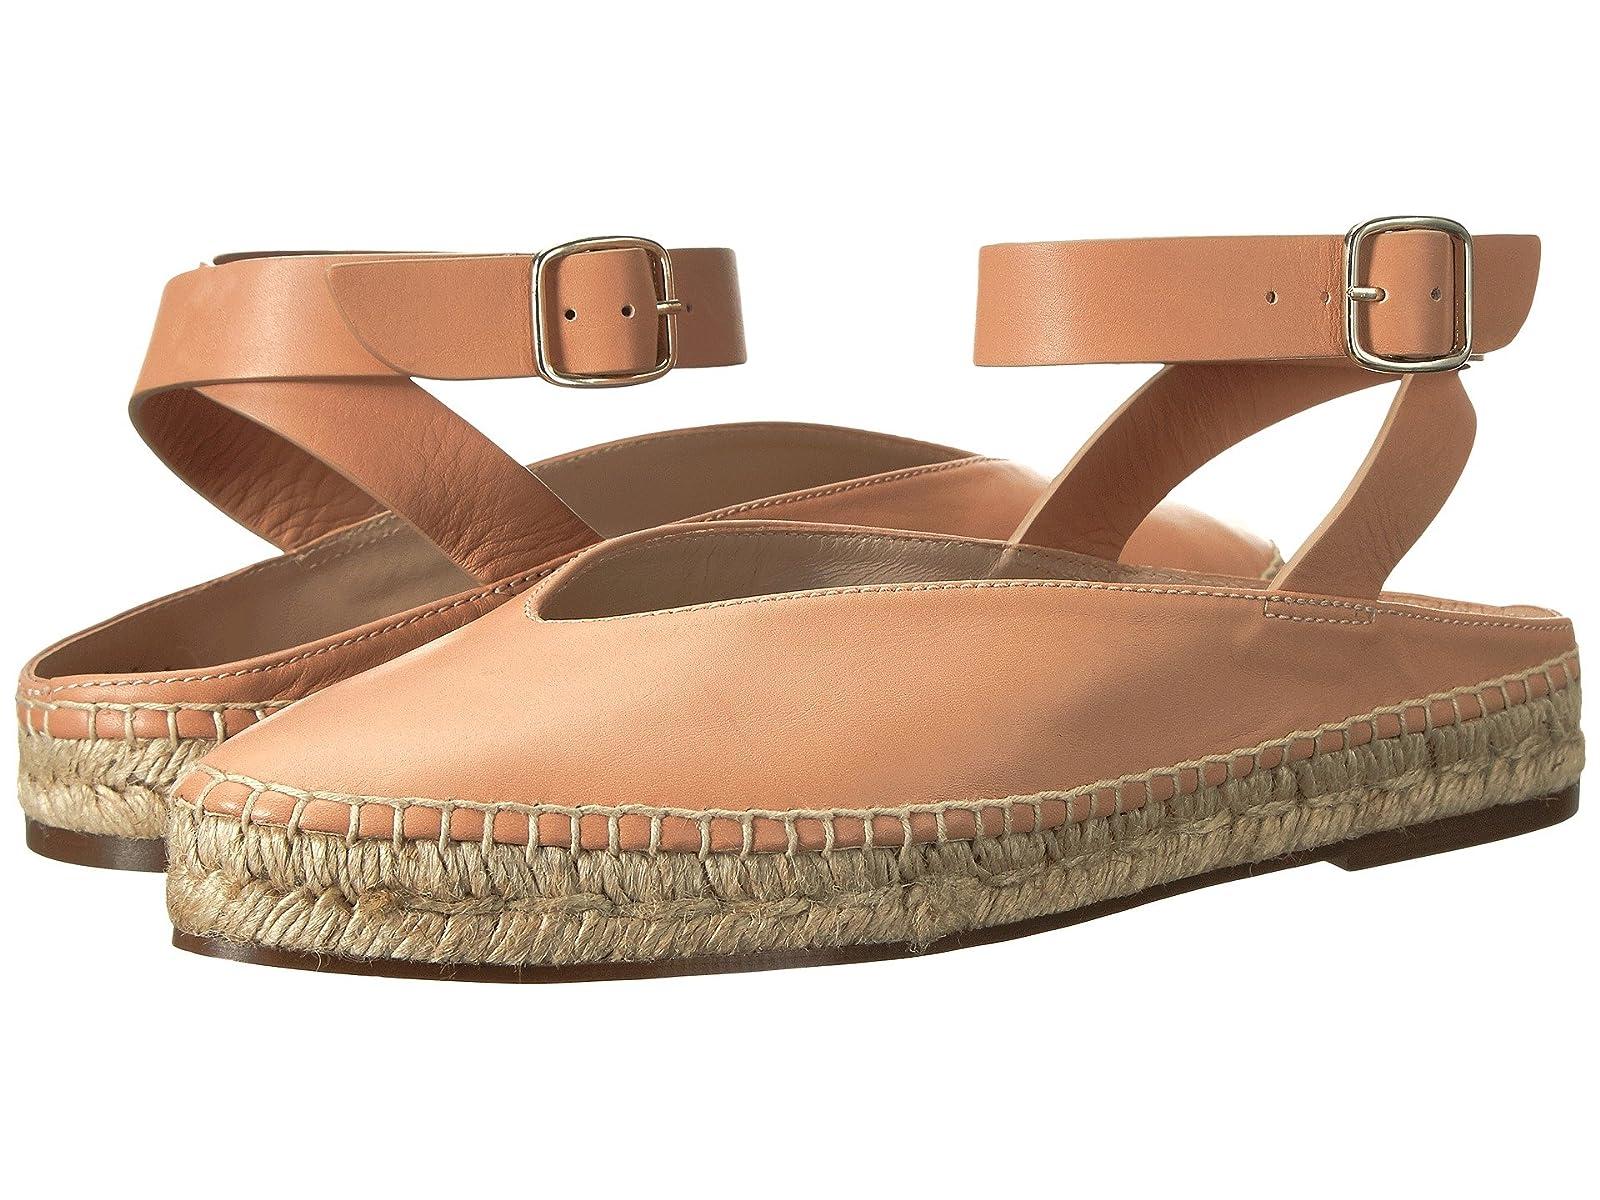 Stuart Weitzman TogaAtmospheric grades have affordable shoes